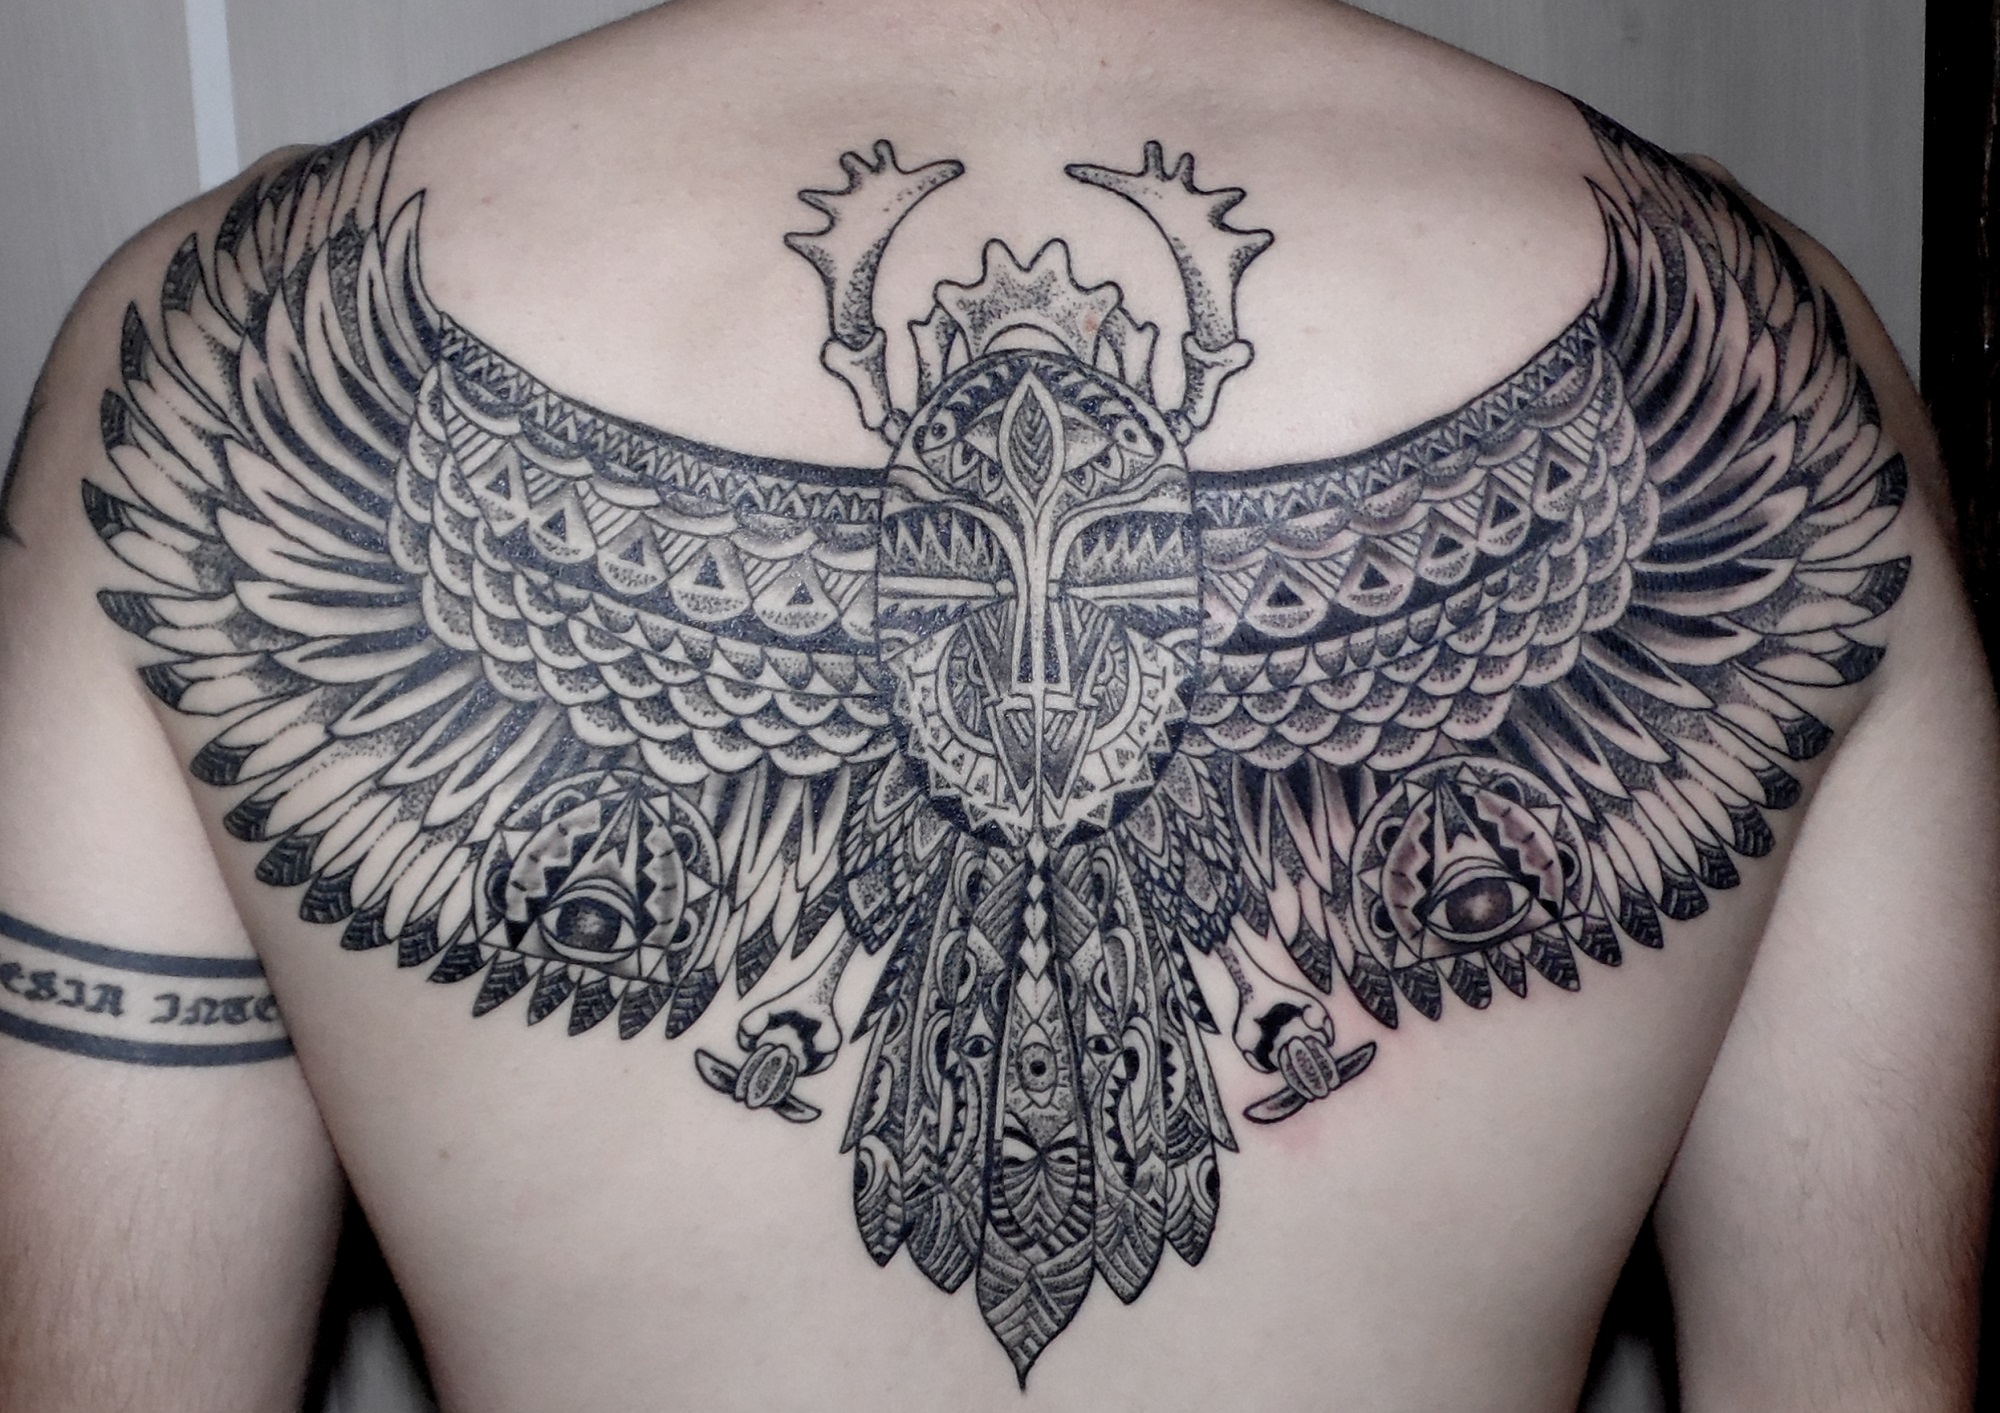 escarabajo egipcio tatuaje tattoo espalda alas punteado negro gris 13depicas Jaca Huesca